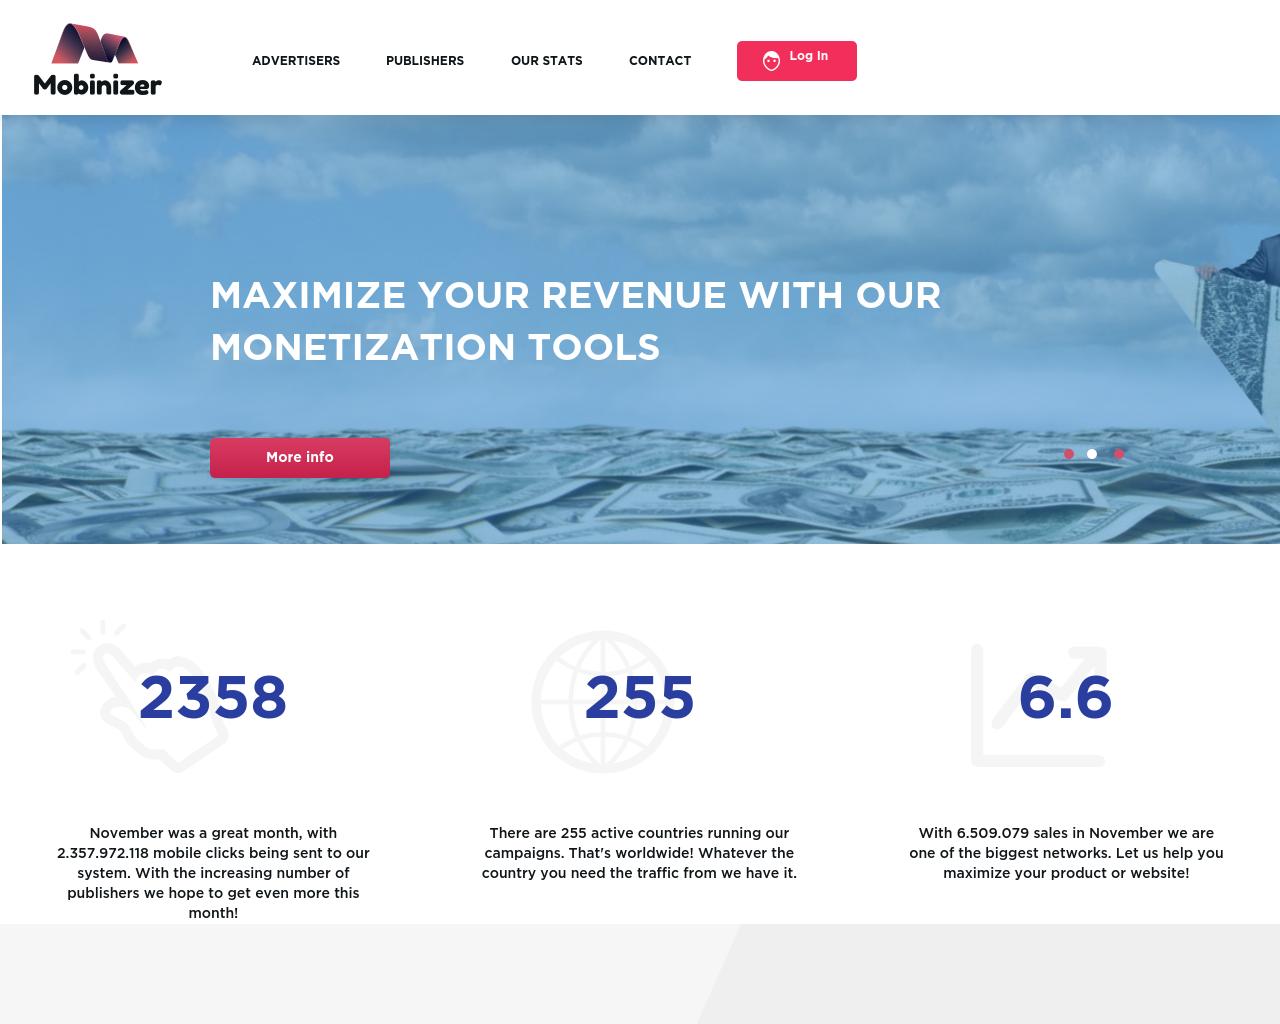 Mobinizer-Advertising-Reviews-Pricing